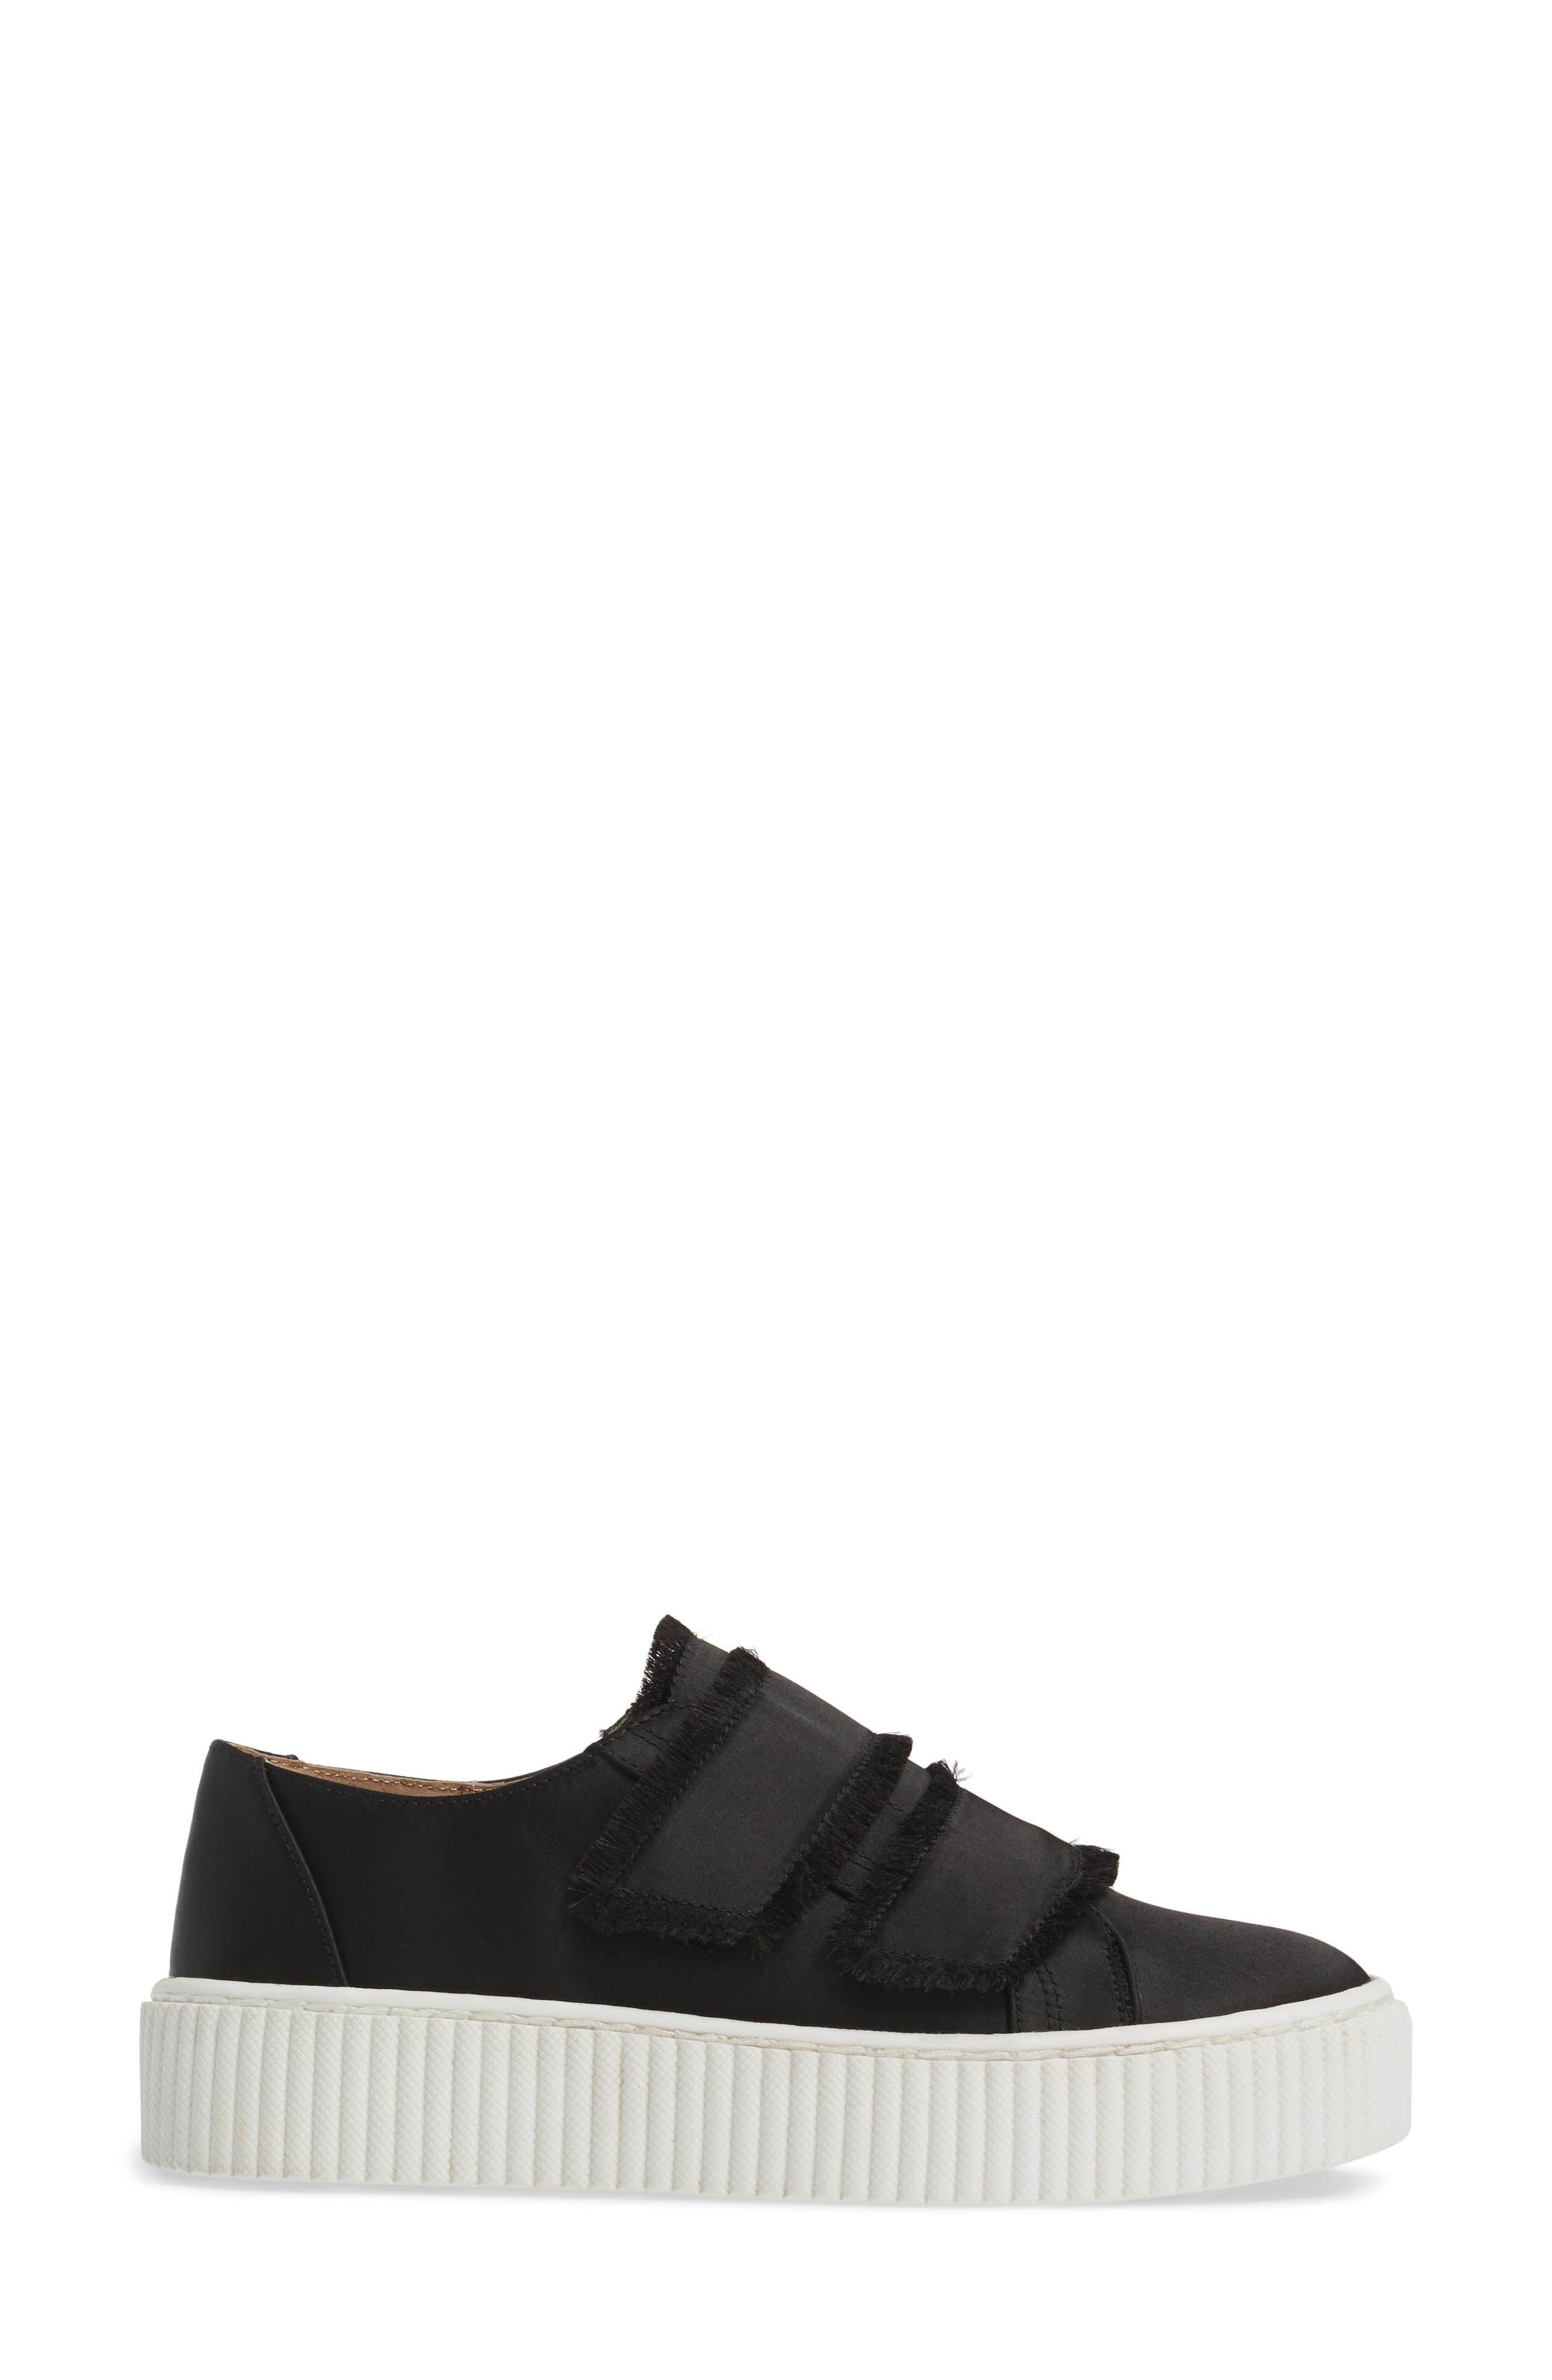 Elder Fringed Platform Sneaker,                             Alternate thumbnail 3, color,                             Black